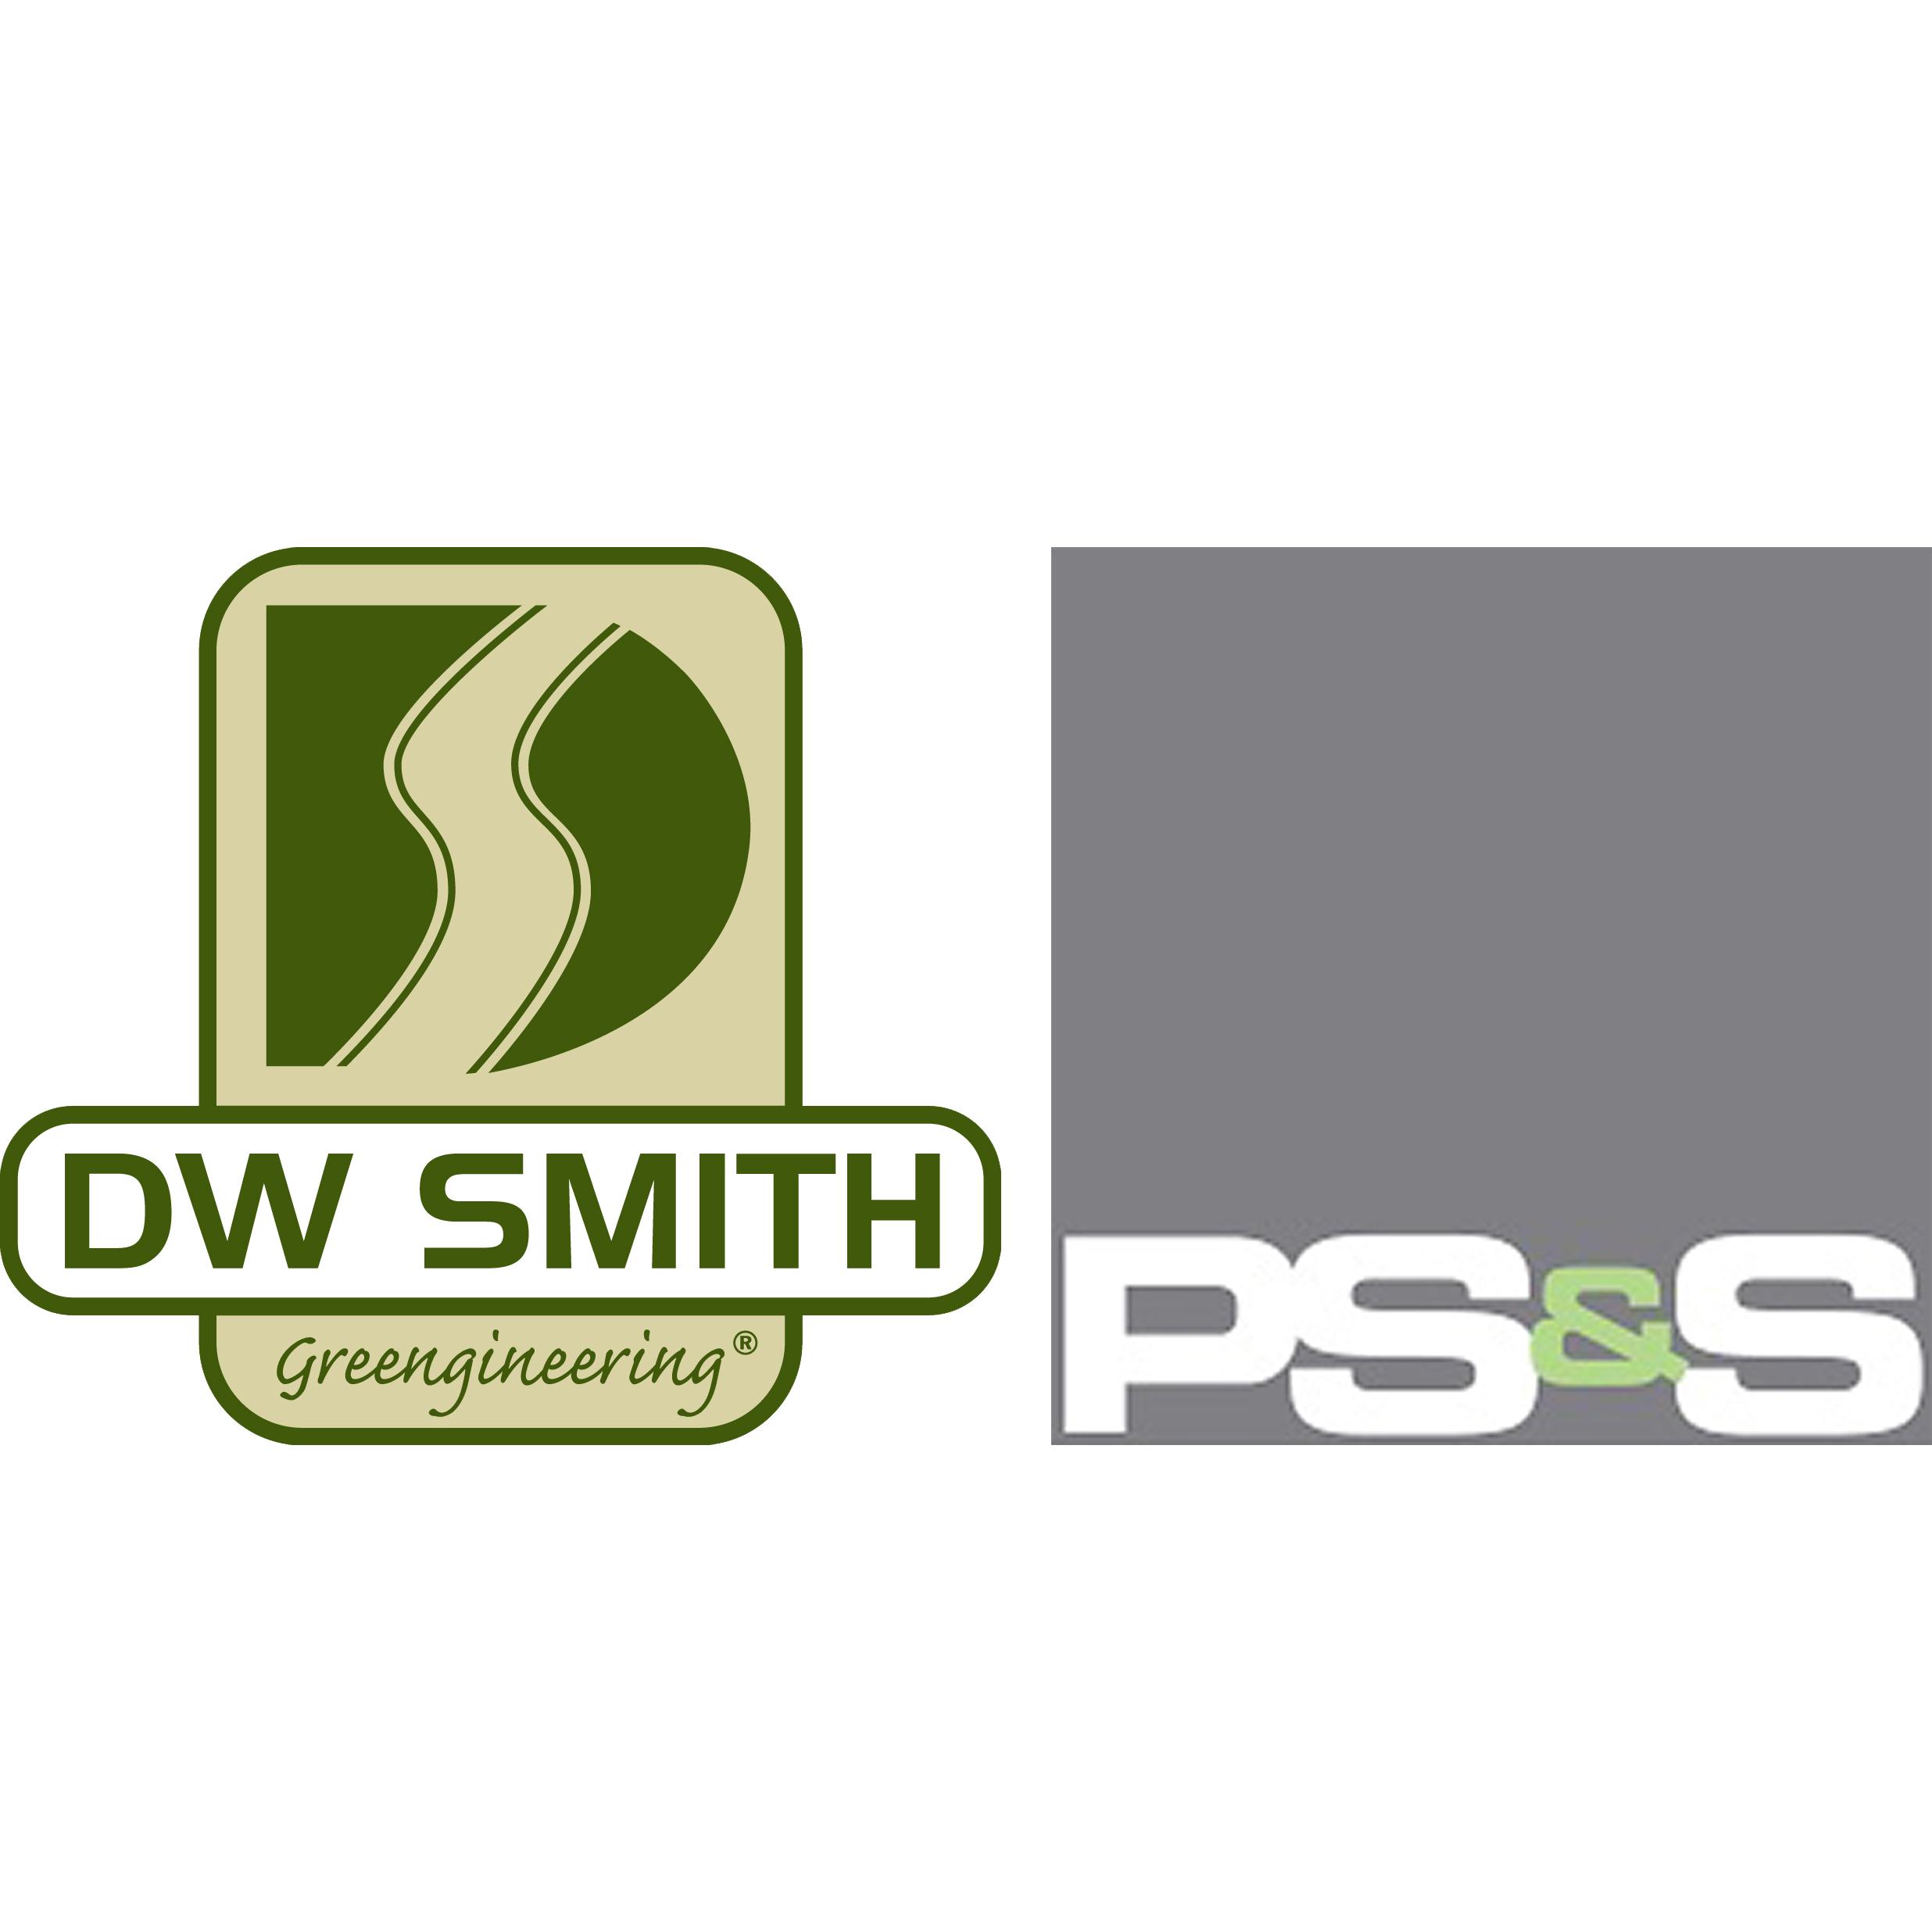 DW Smith Associates, LLC a subsidiary of PS&S, LLC